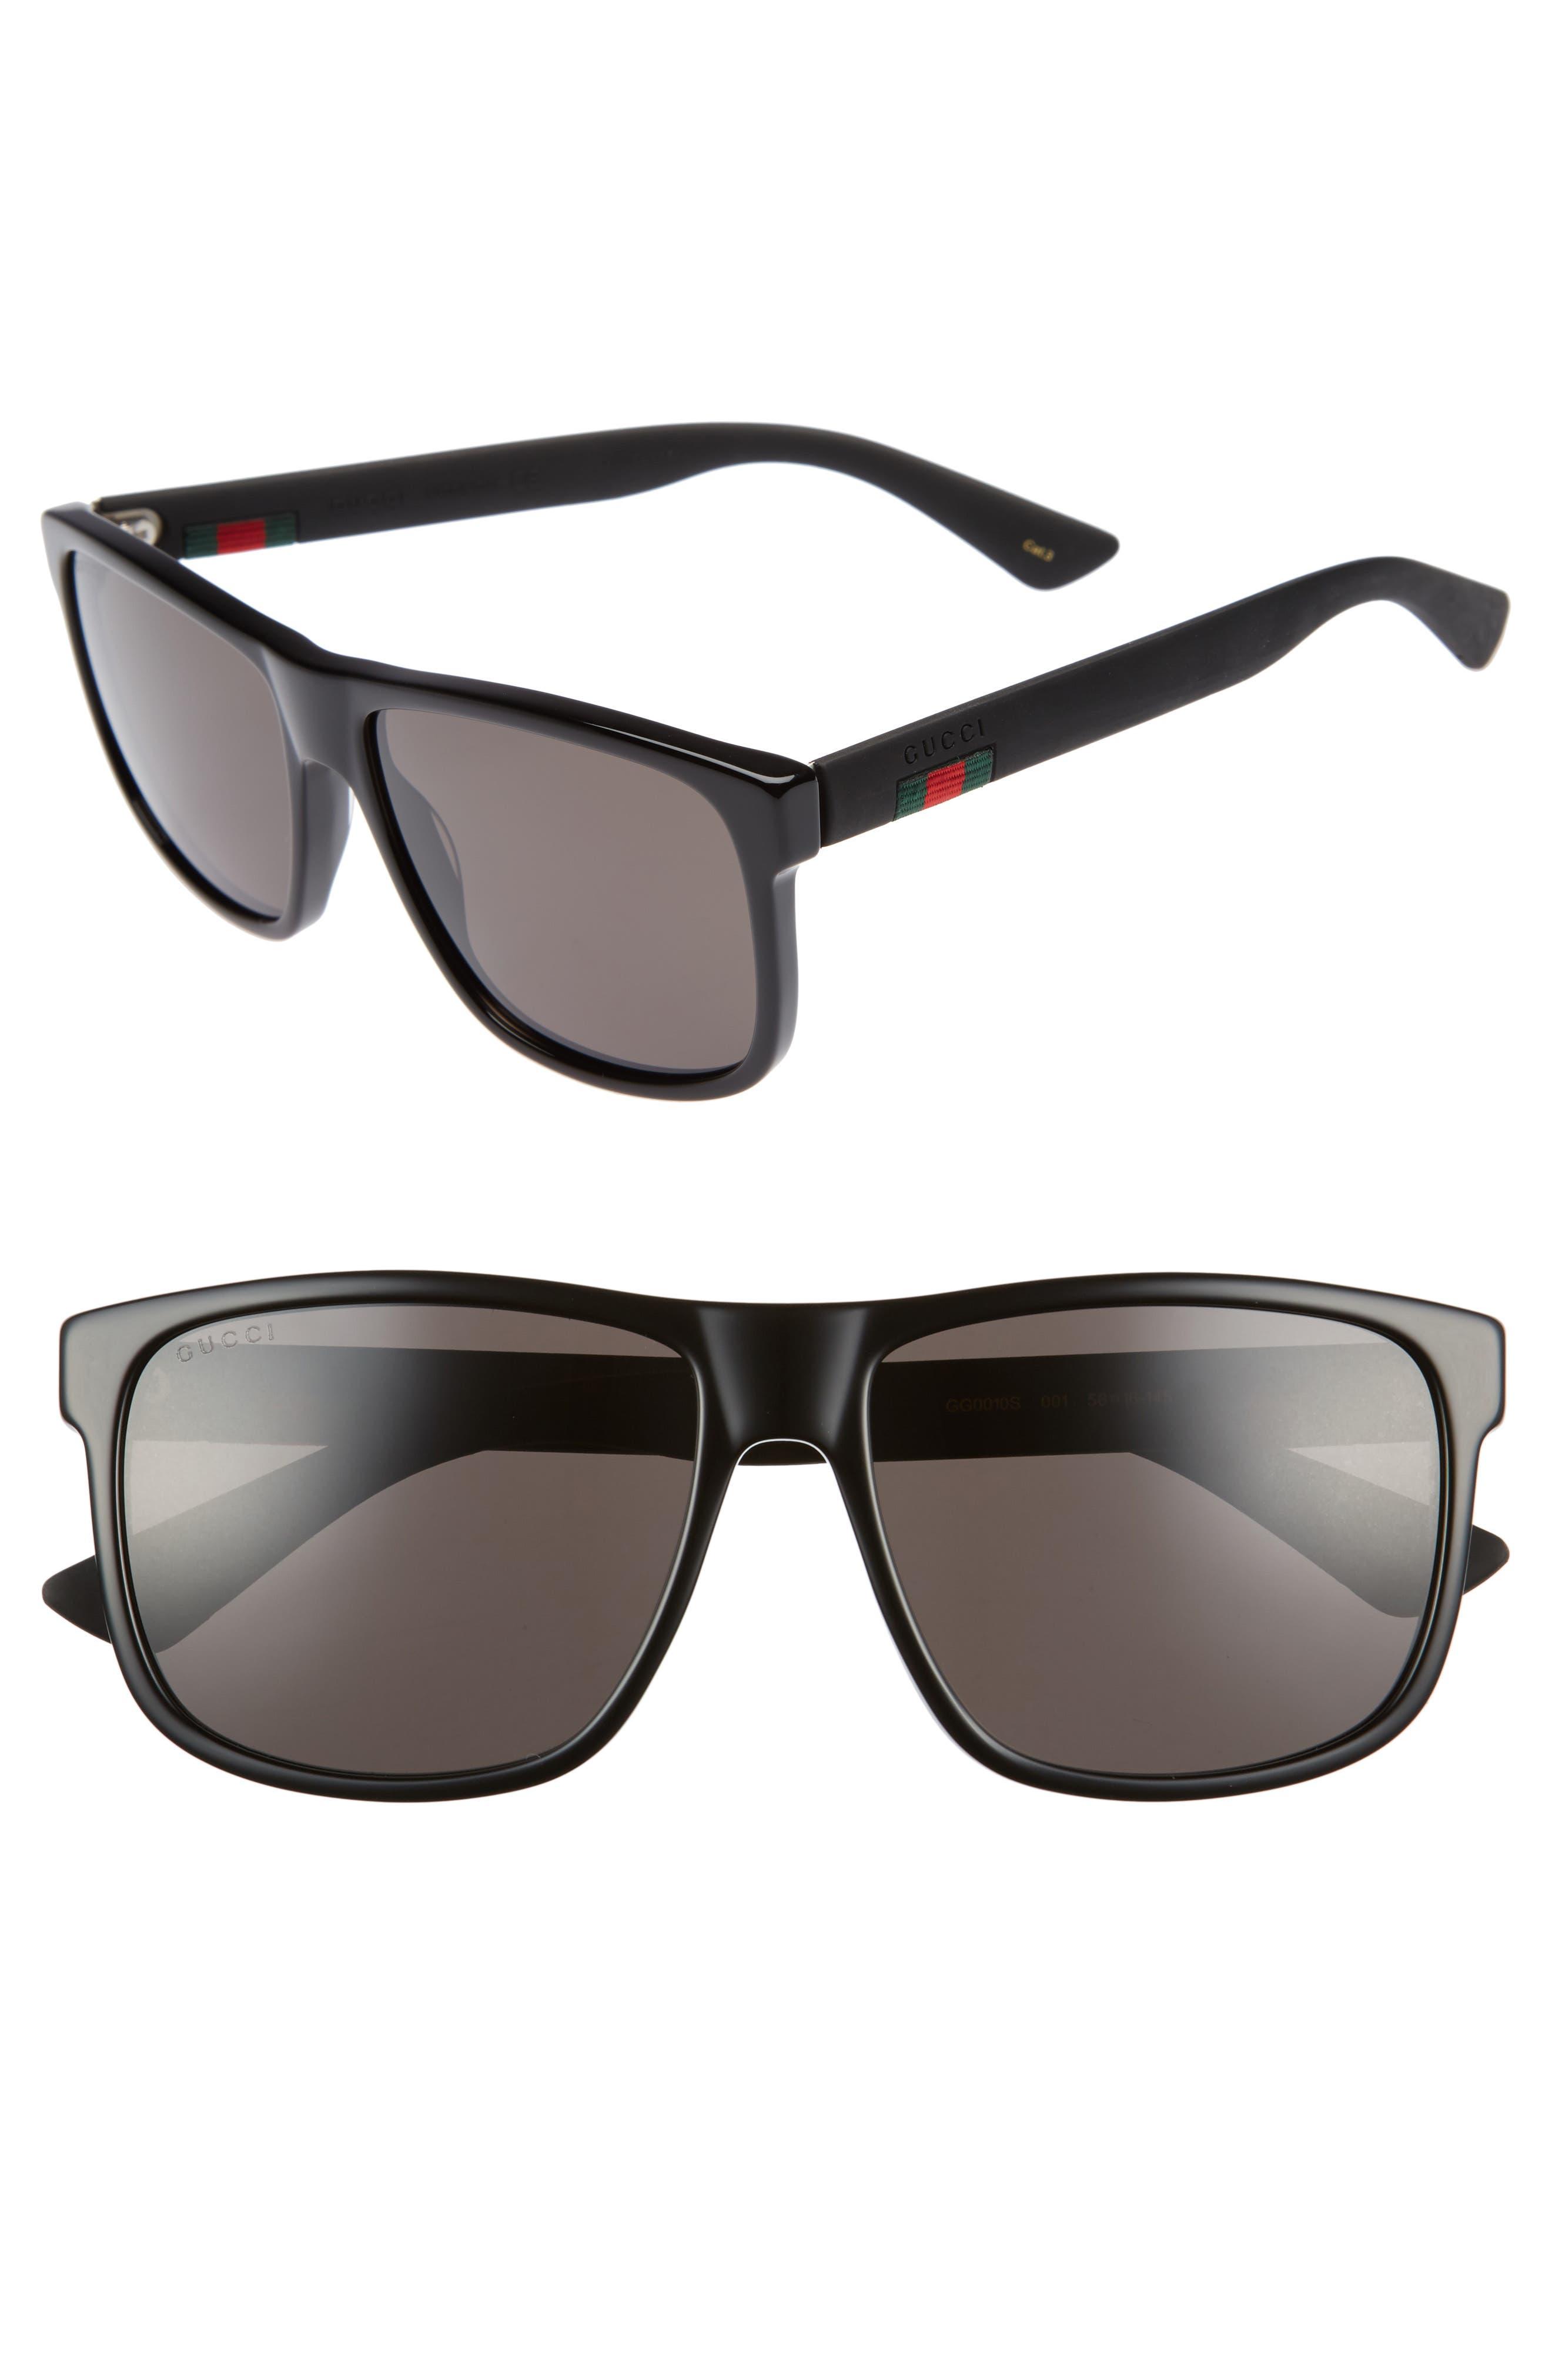 7c30e7b593f Men s Gucci Sunglasses   Eyeglasses